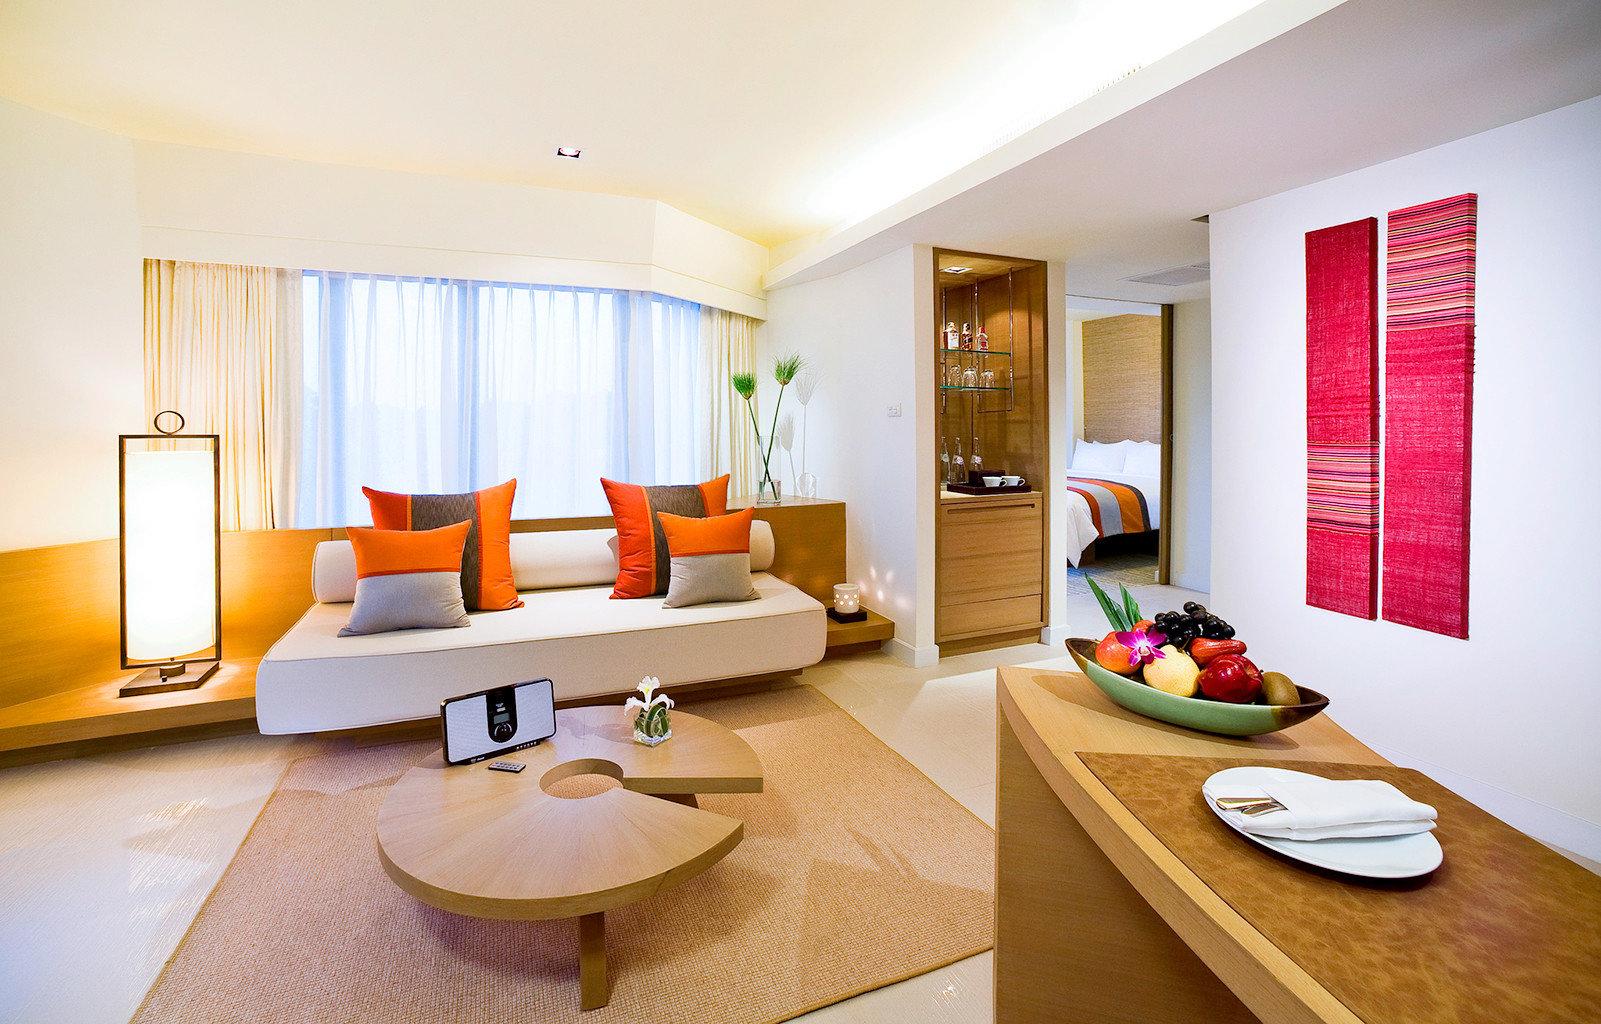 Beachfront Family Honeymoon Island Lounge Resort Romance property condominium Suite living room home Villa flat cottage Bedroom Modern